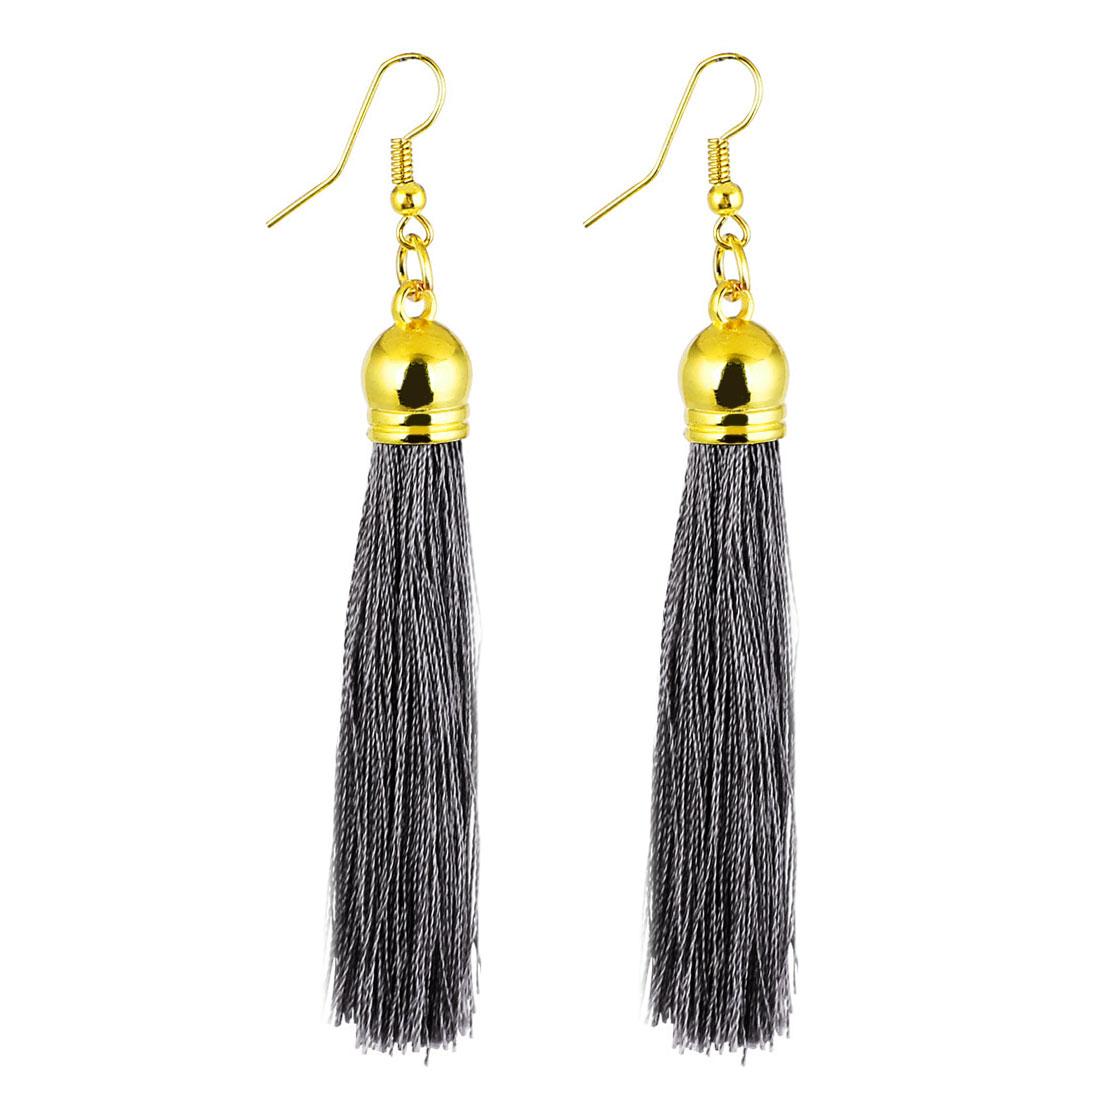 Lady-Fish-Hook-Tassel-Pendant-Dangling-Earrings-Eardrop-3-5-Inch-Long-Pair